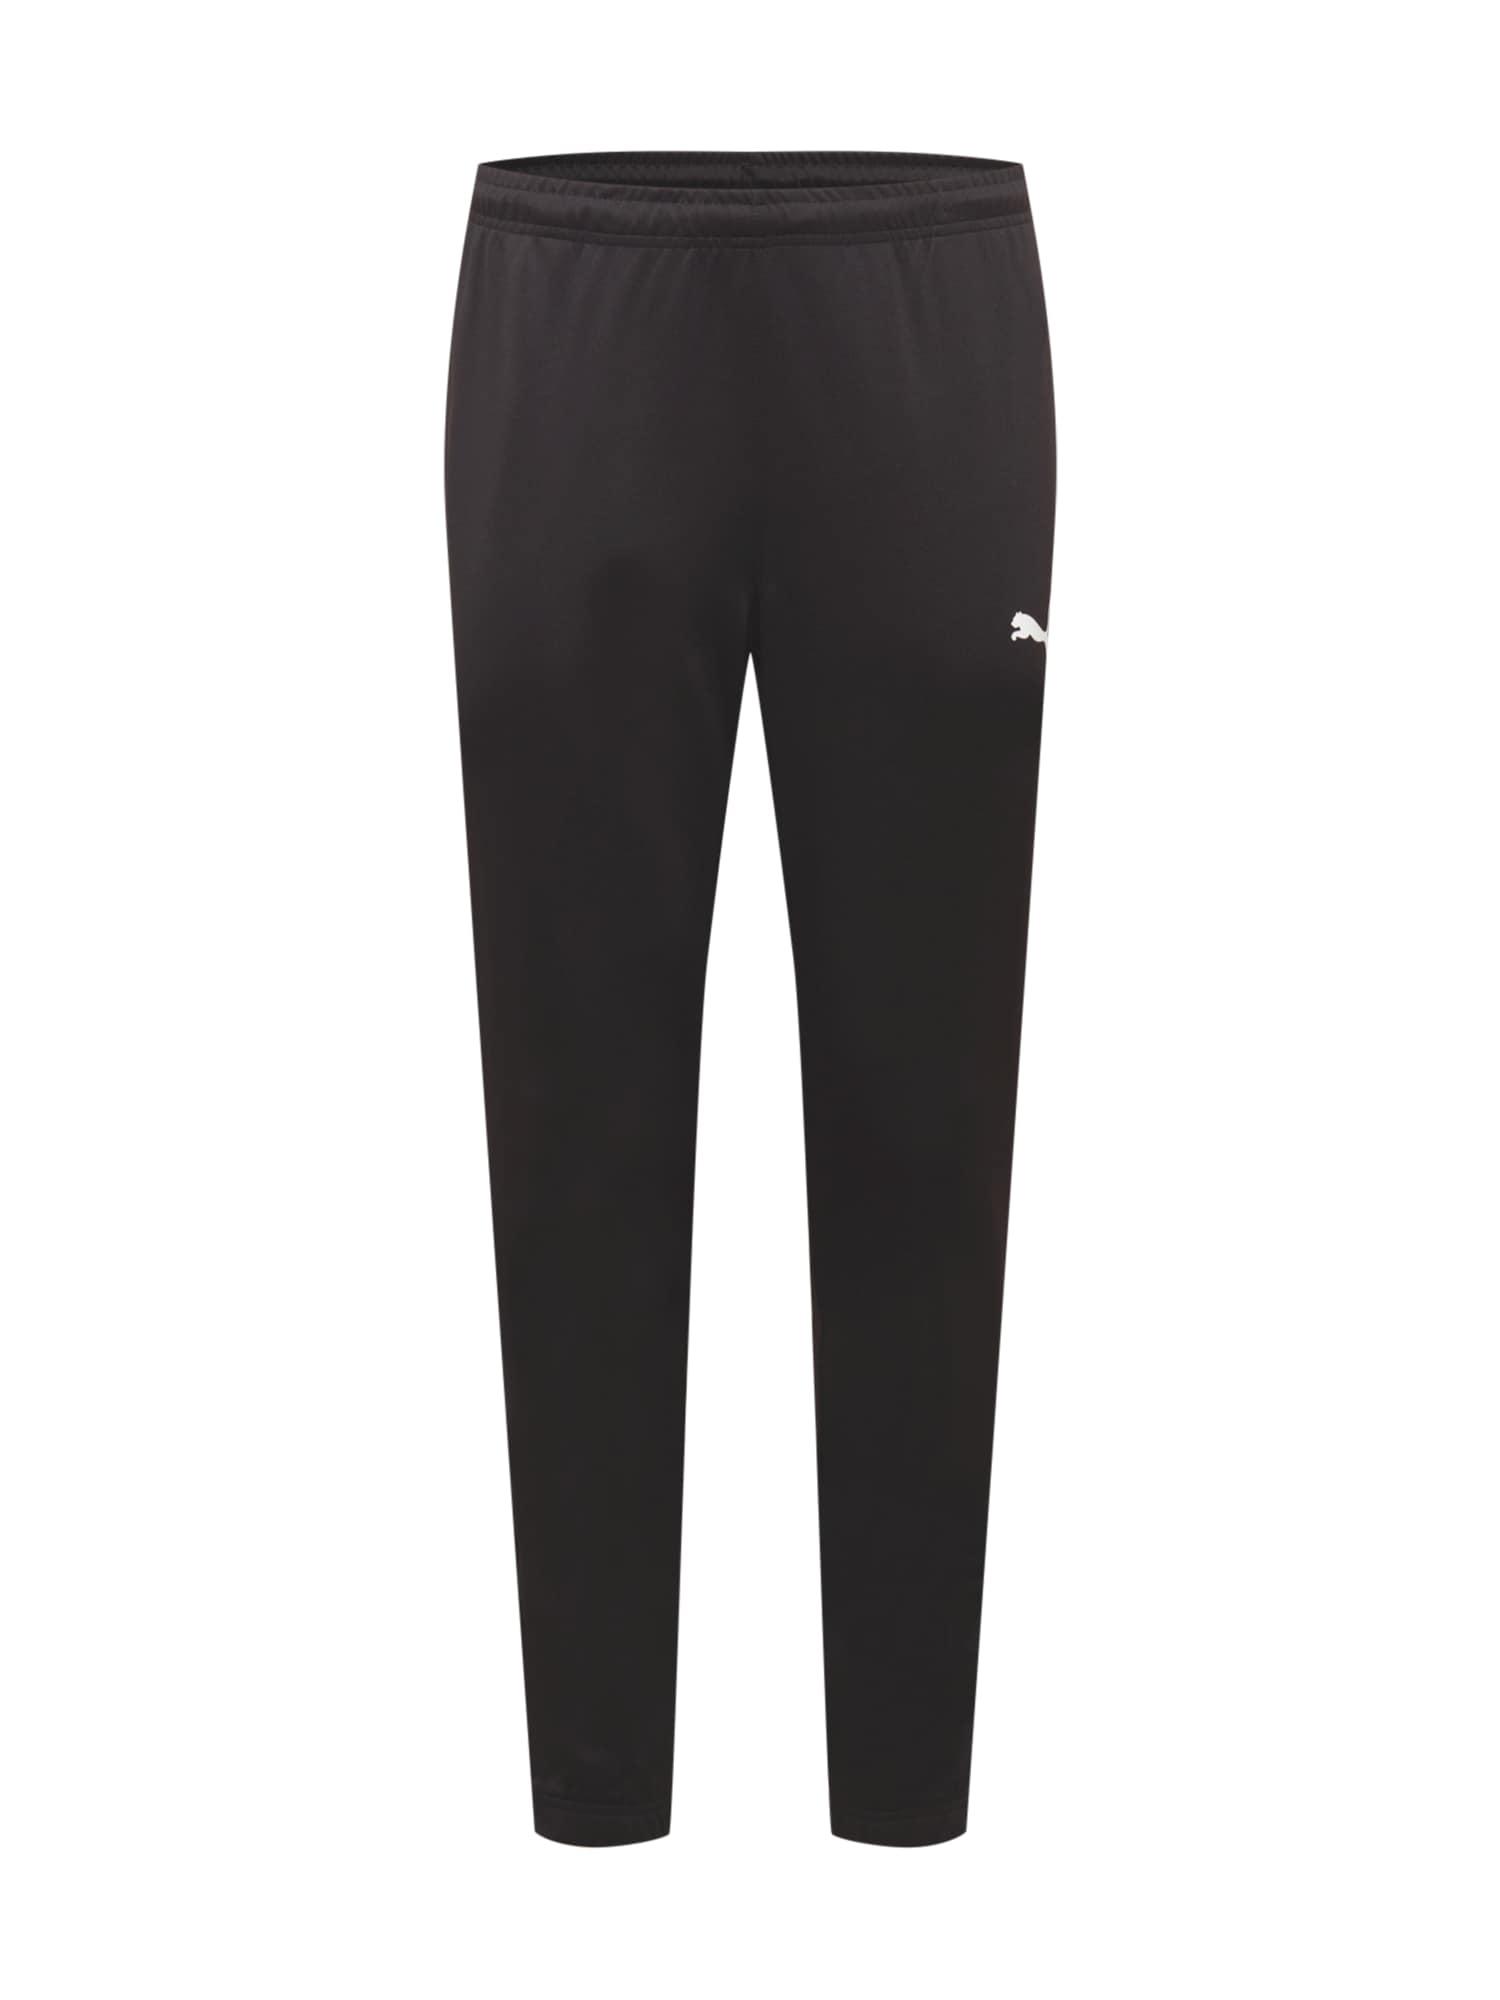 PUMA Pantaloni sportivi 'teamRISE'  nero / bianco male shop the look